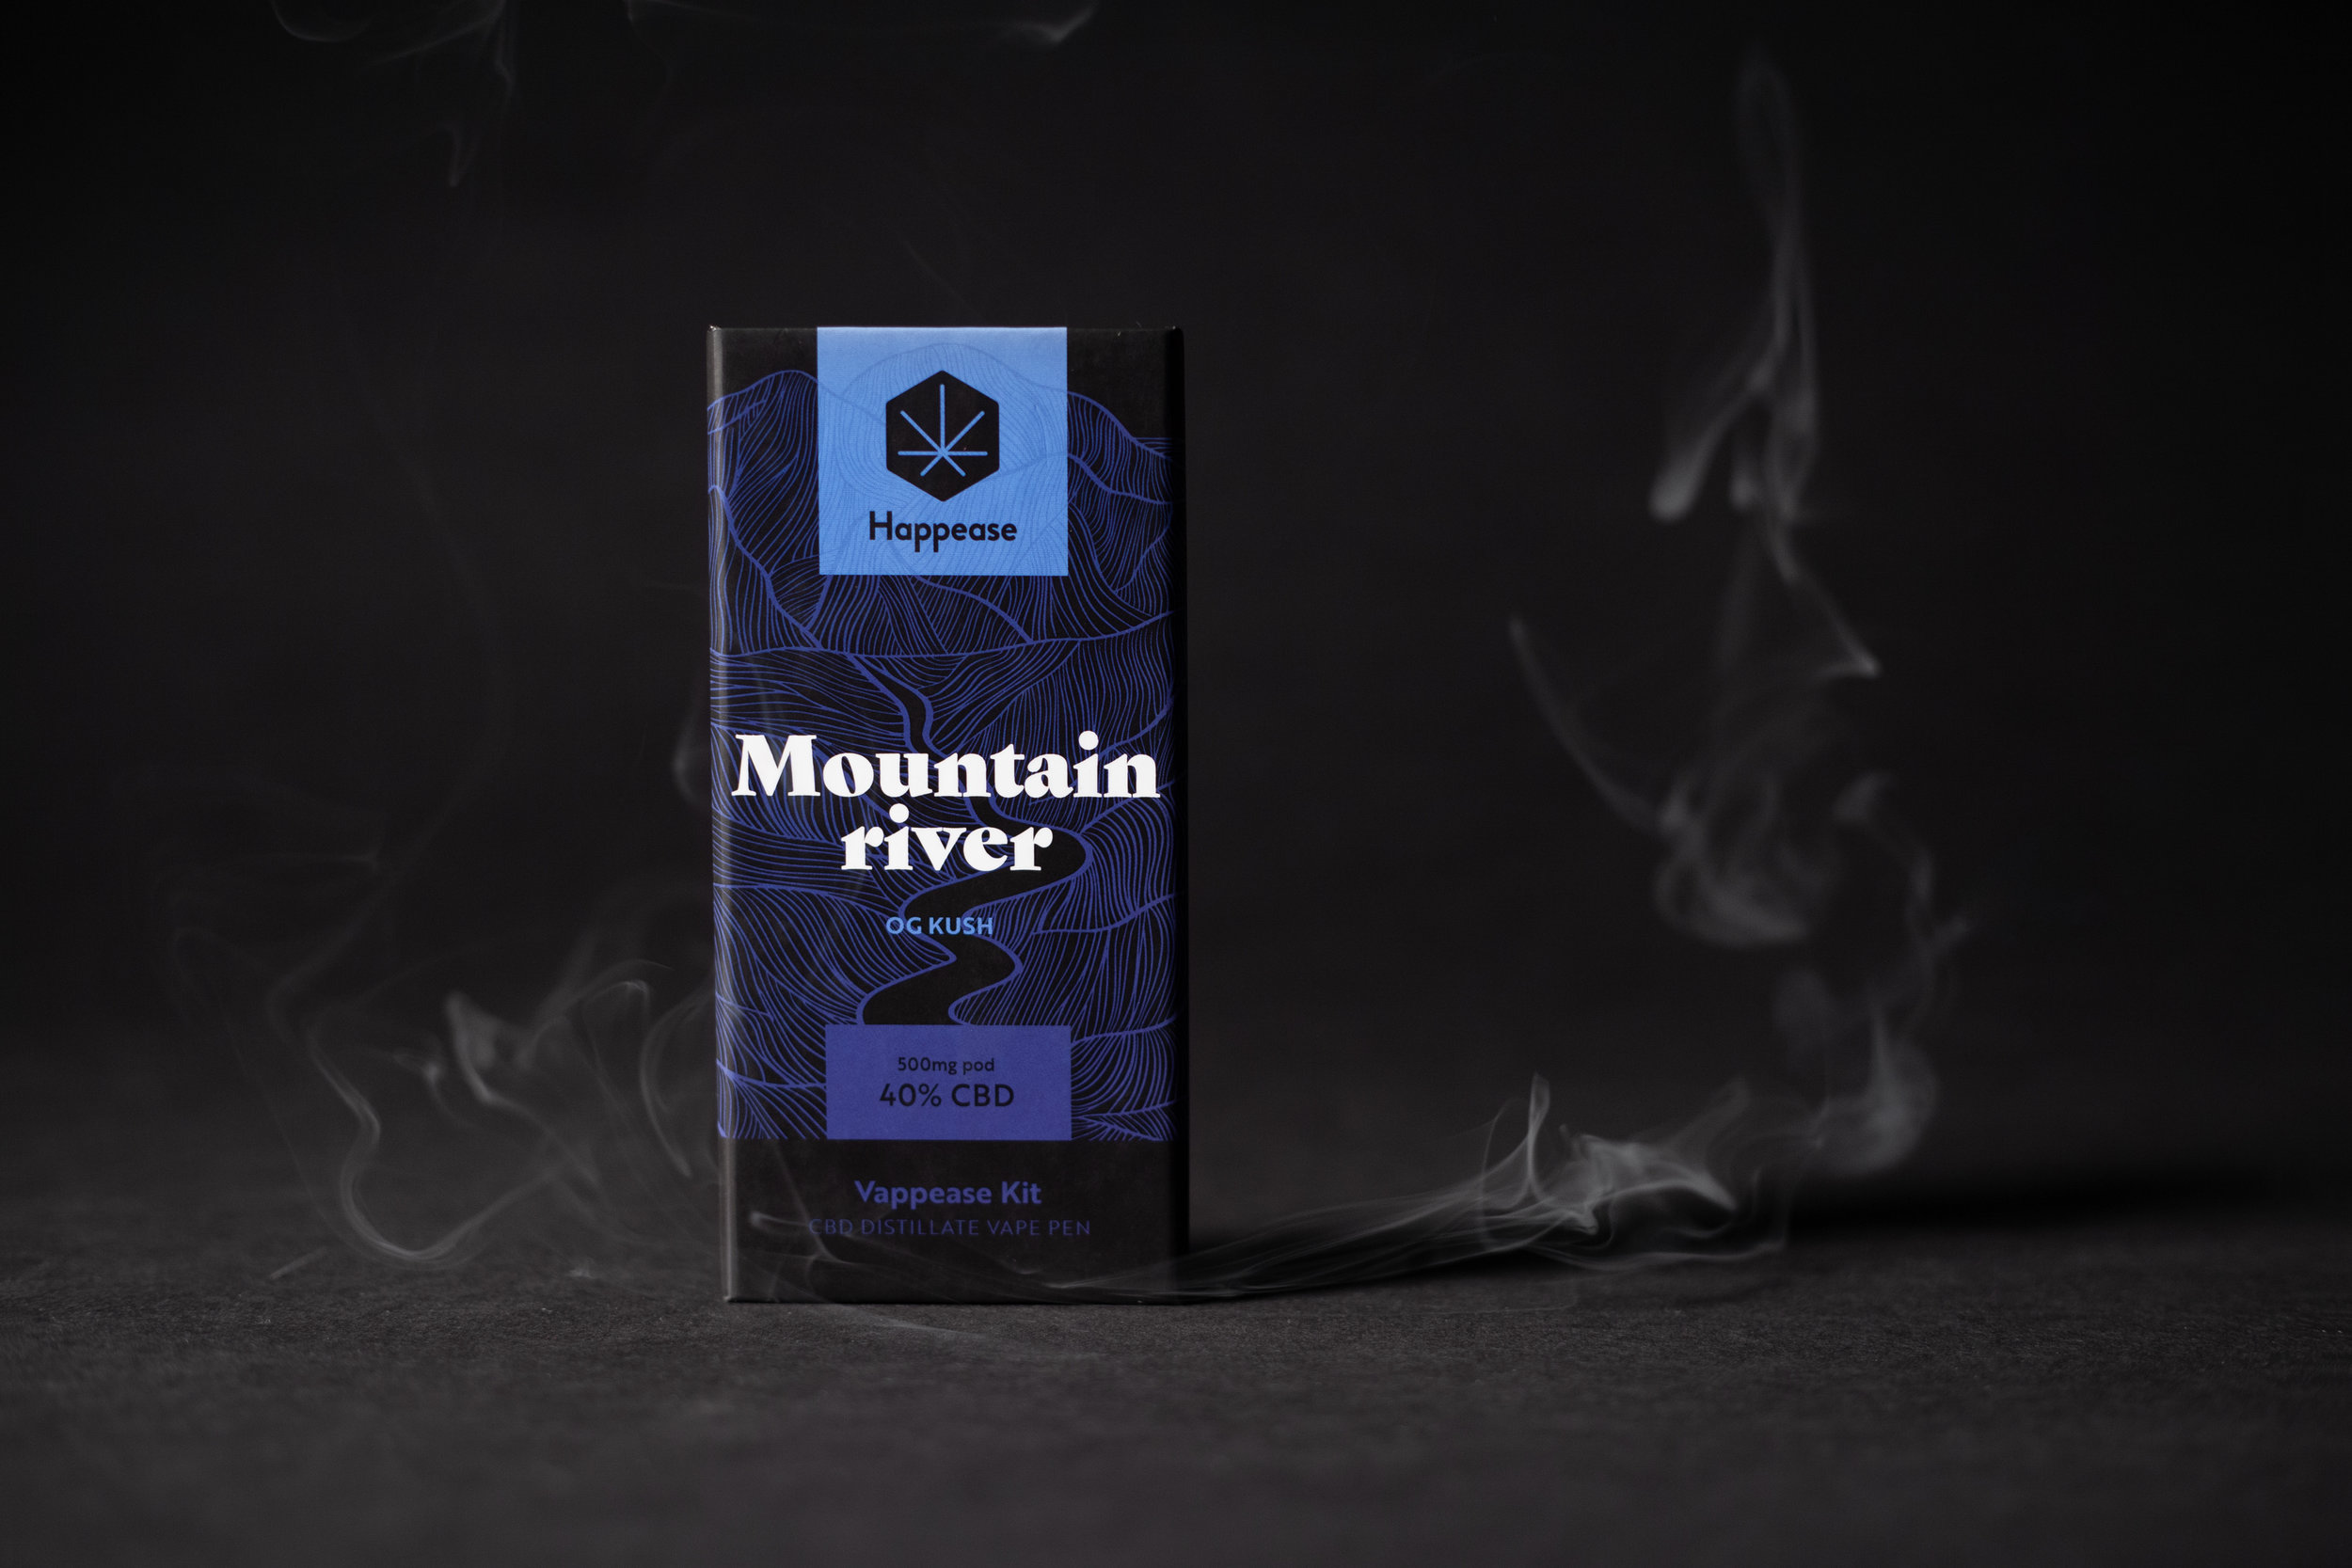 Happease packaging design